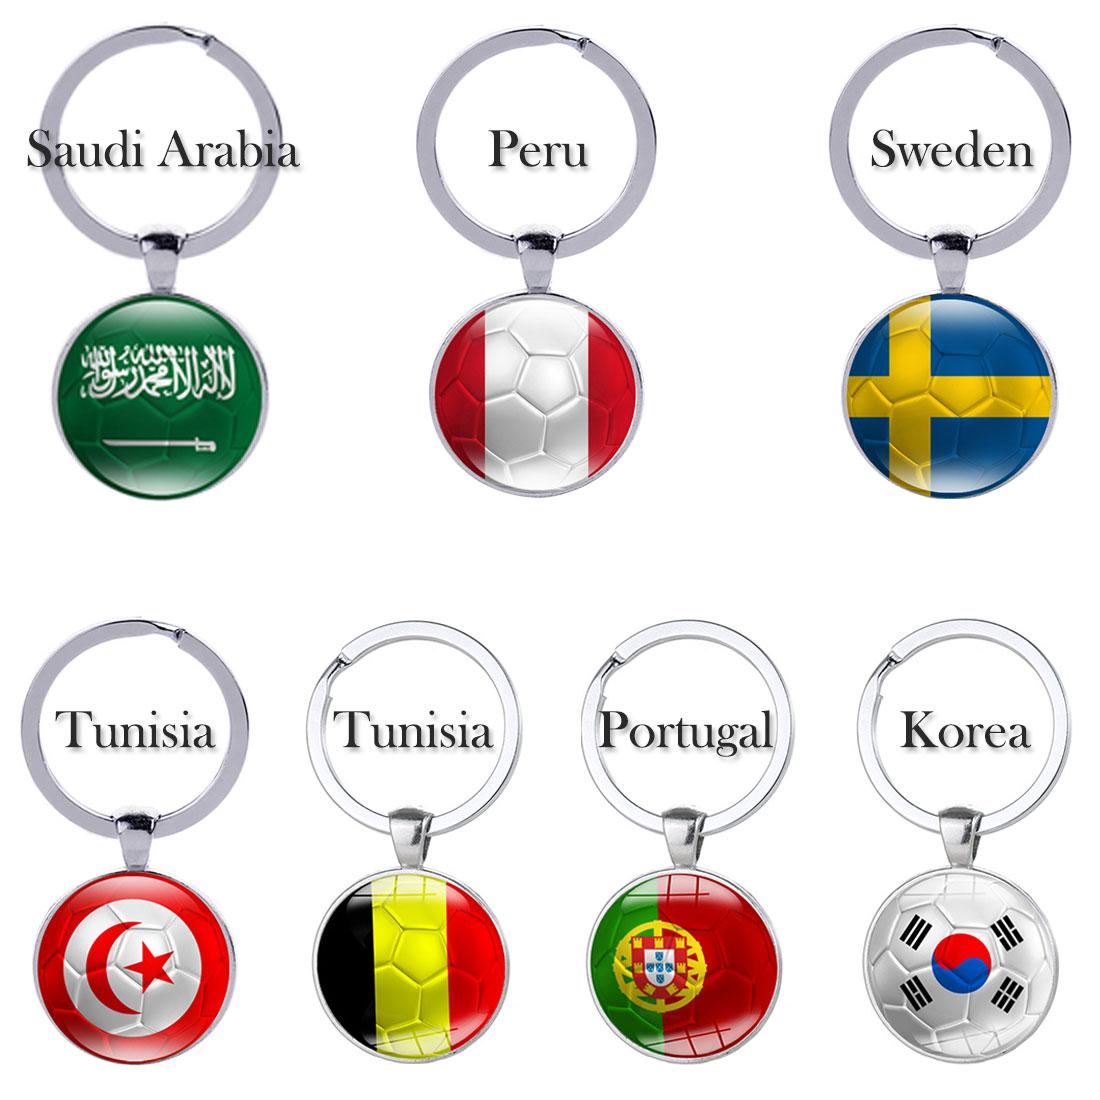 Wholesale Lot of 12 Souvenir Keychains I Love Peru Free Shipping